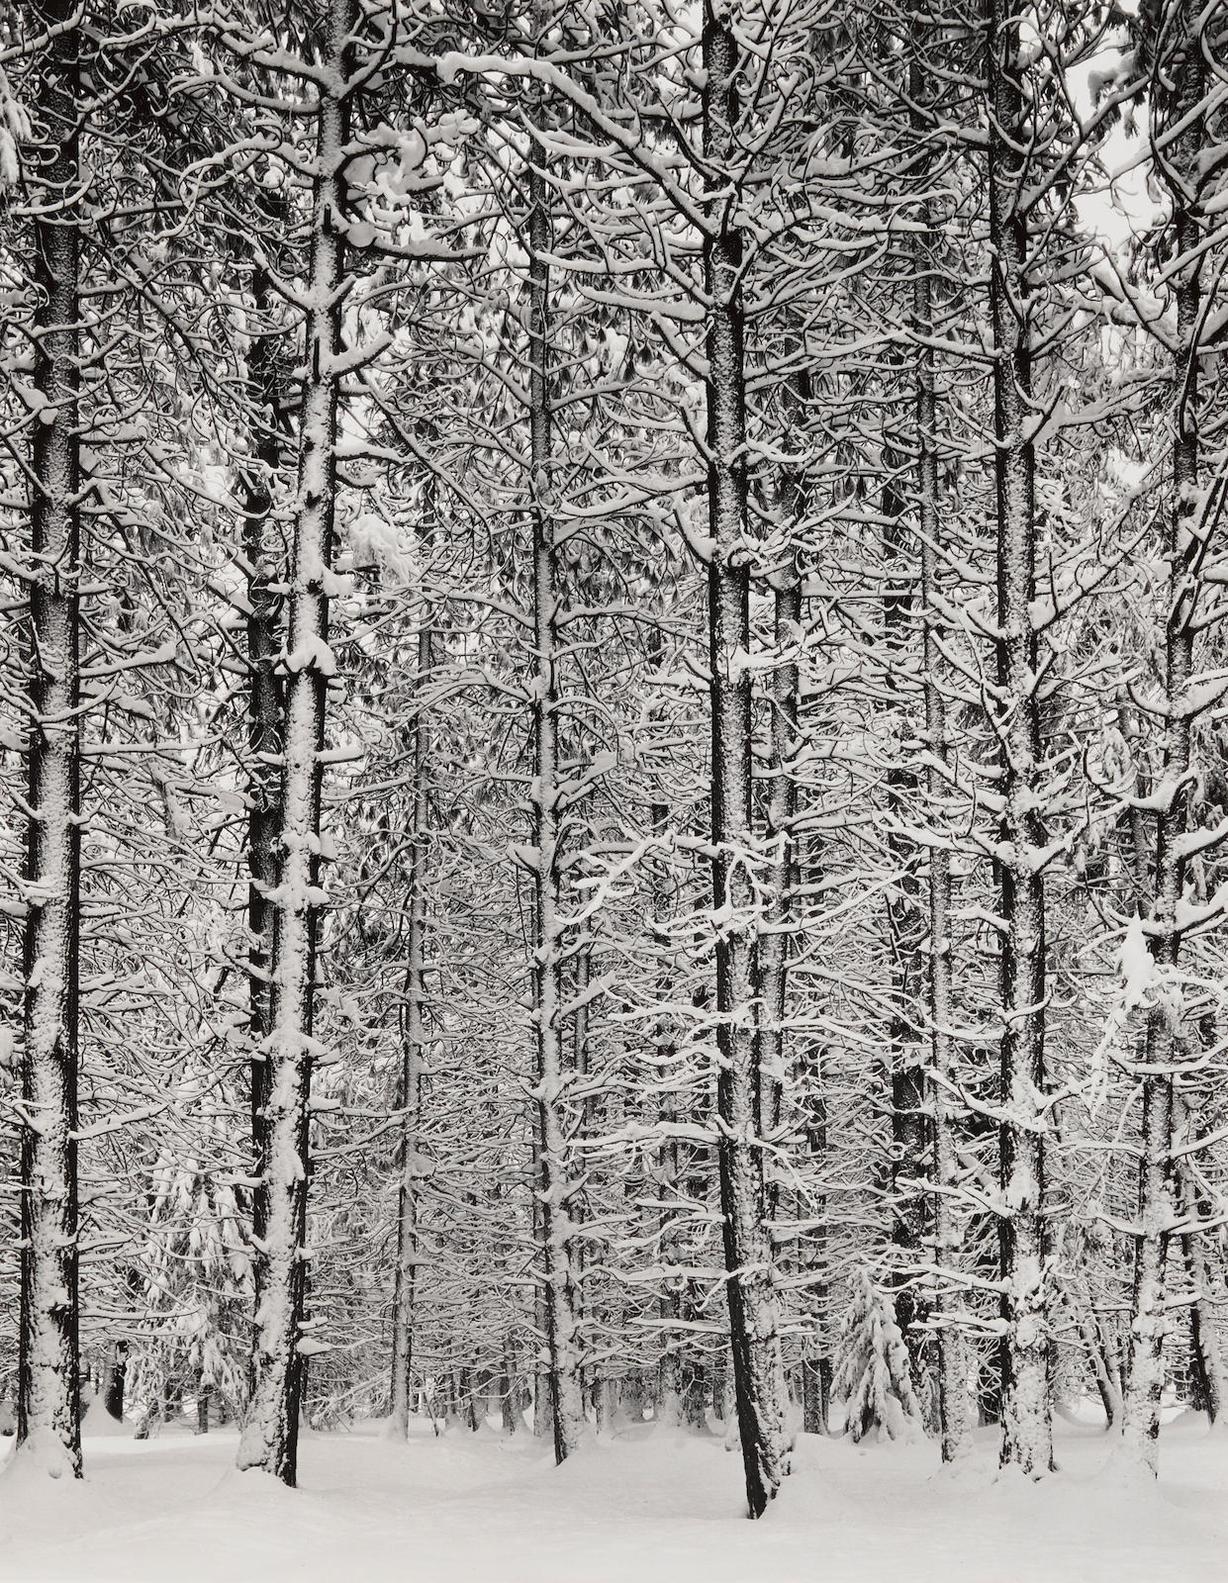 Ansel Adams-Trees And Snow, Yosemite, From Portfolio III-1932